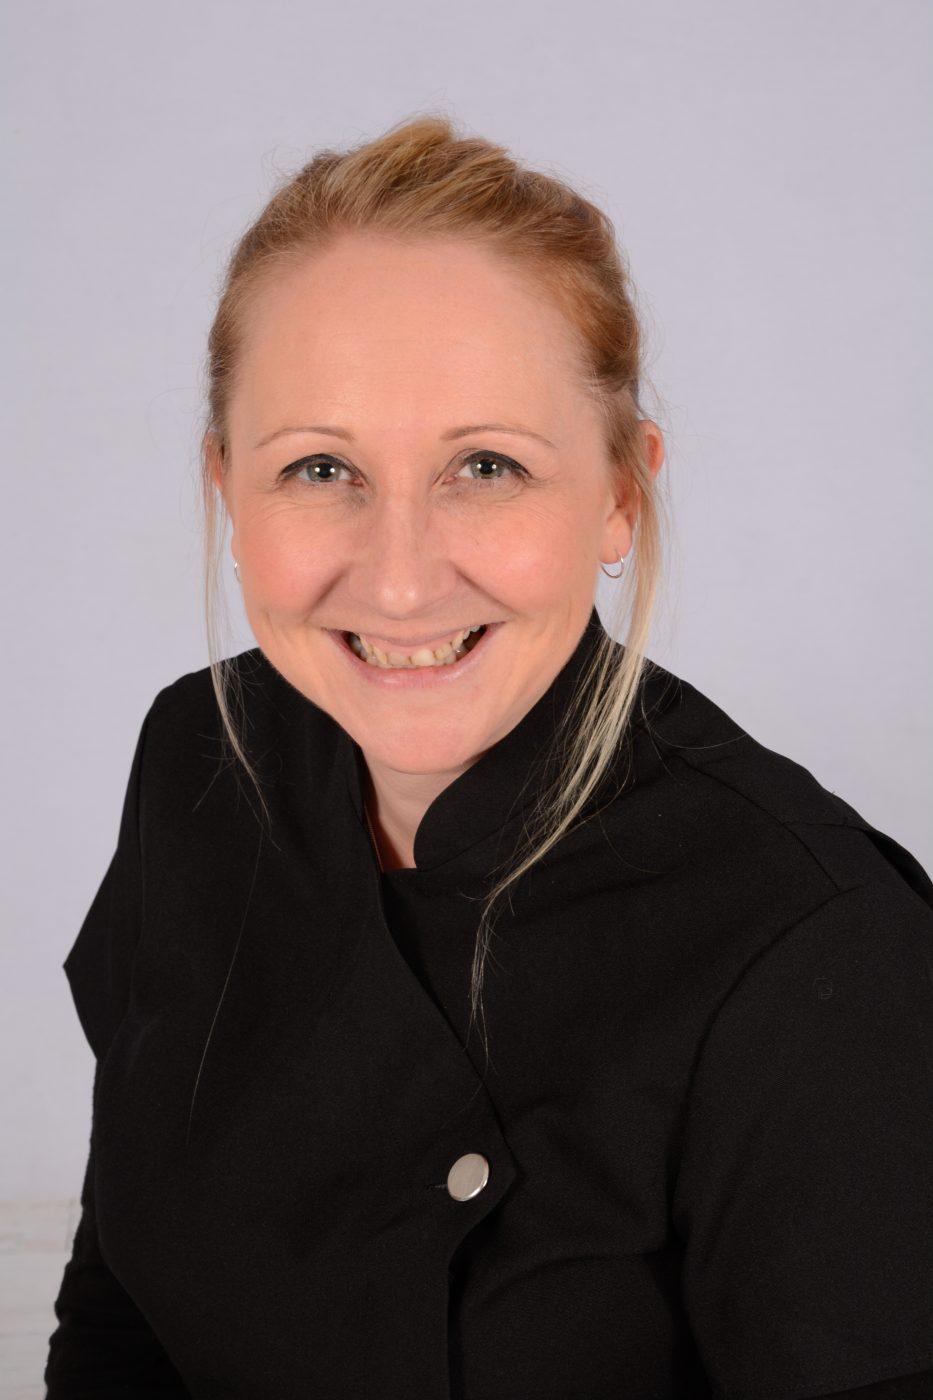 Liz Olliver, BA (Hons), EYP